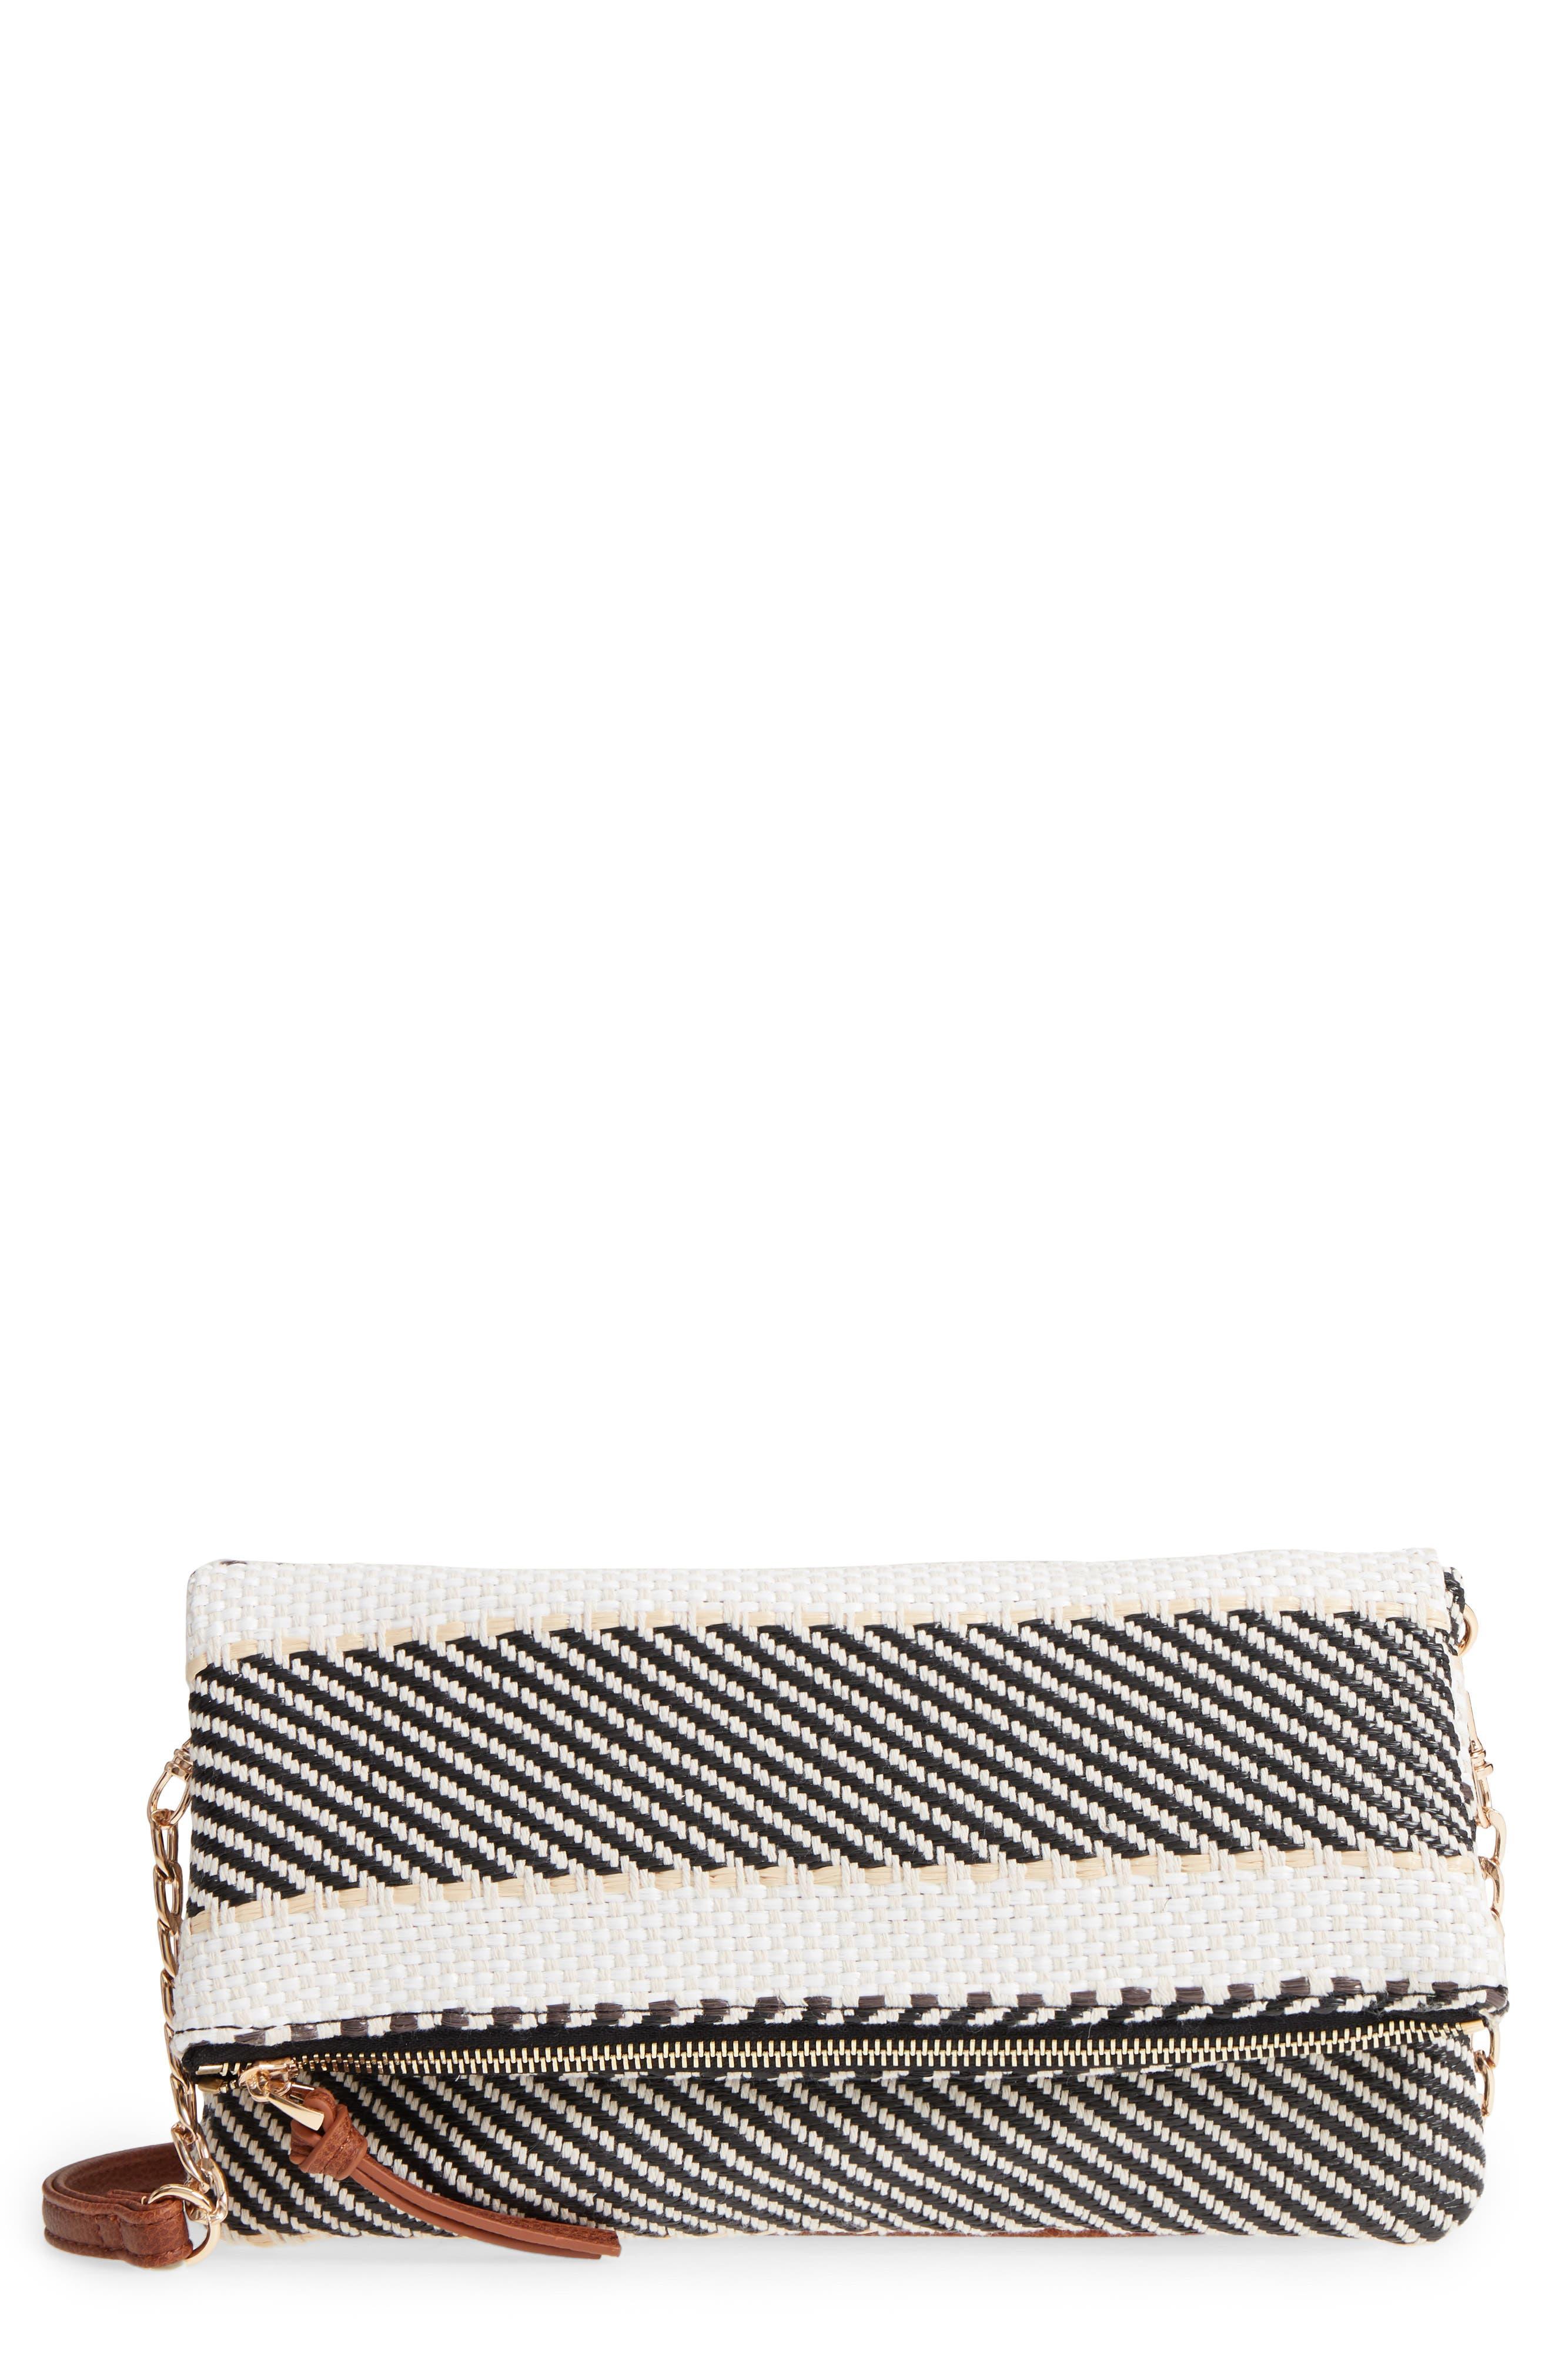 Medina Fabric Foldover Clutch,                         Main,                         color, Black/ Cream Combo